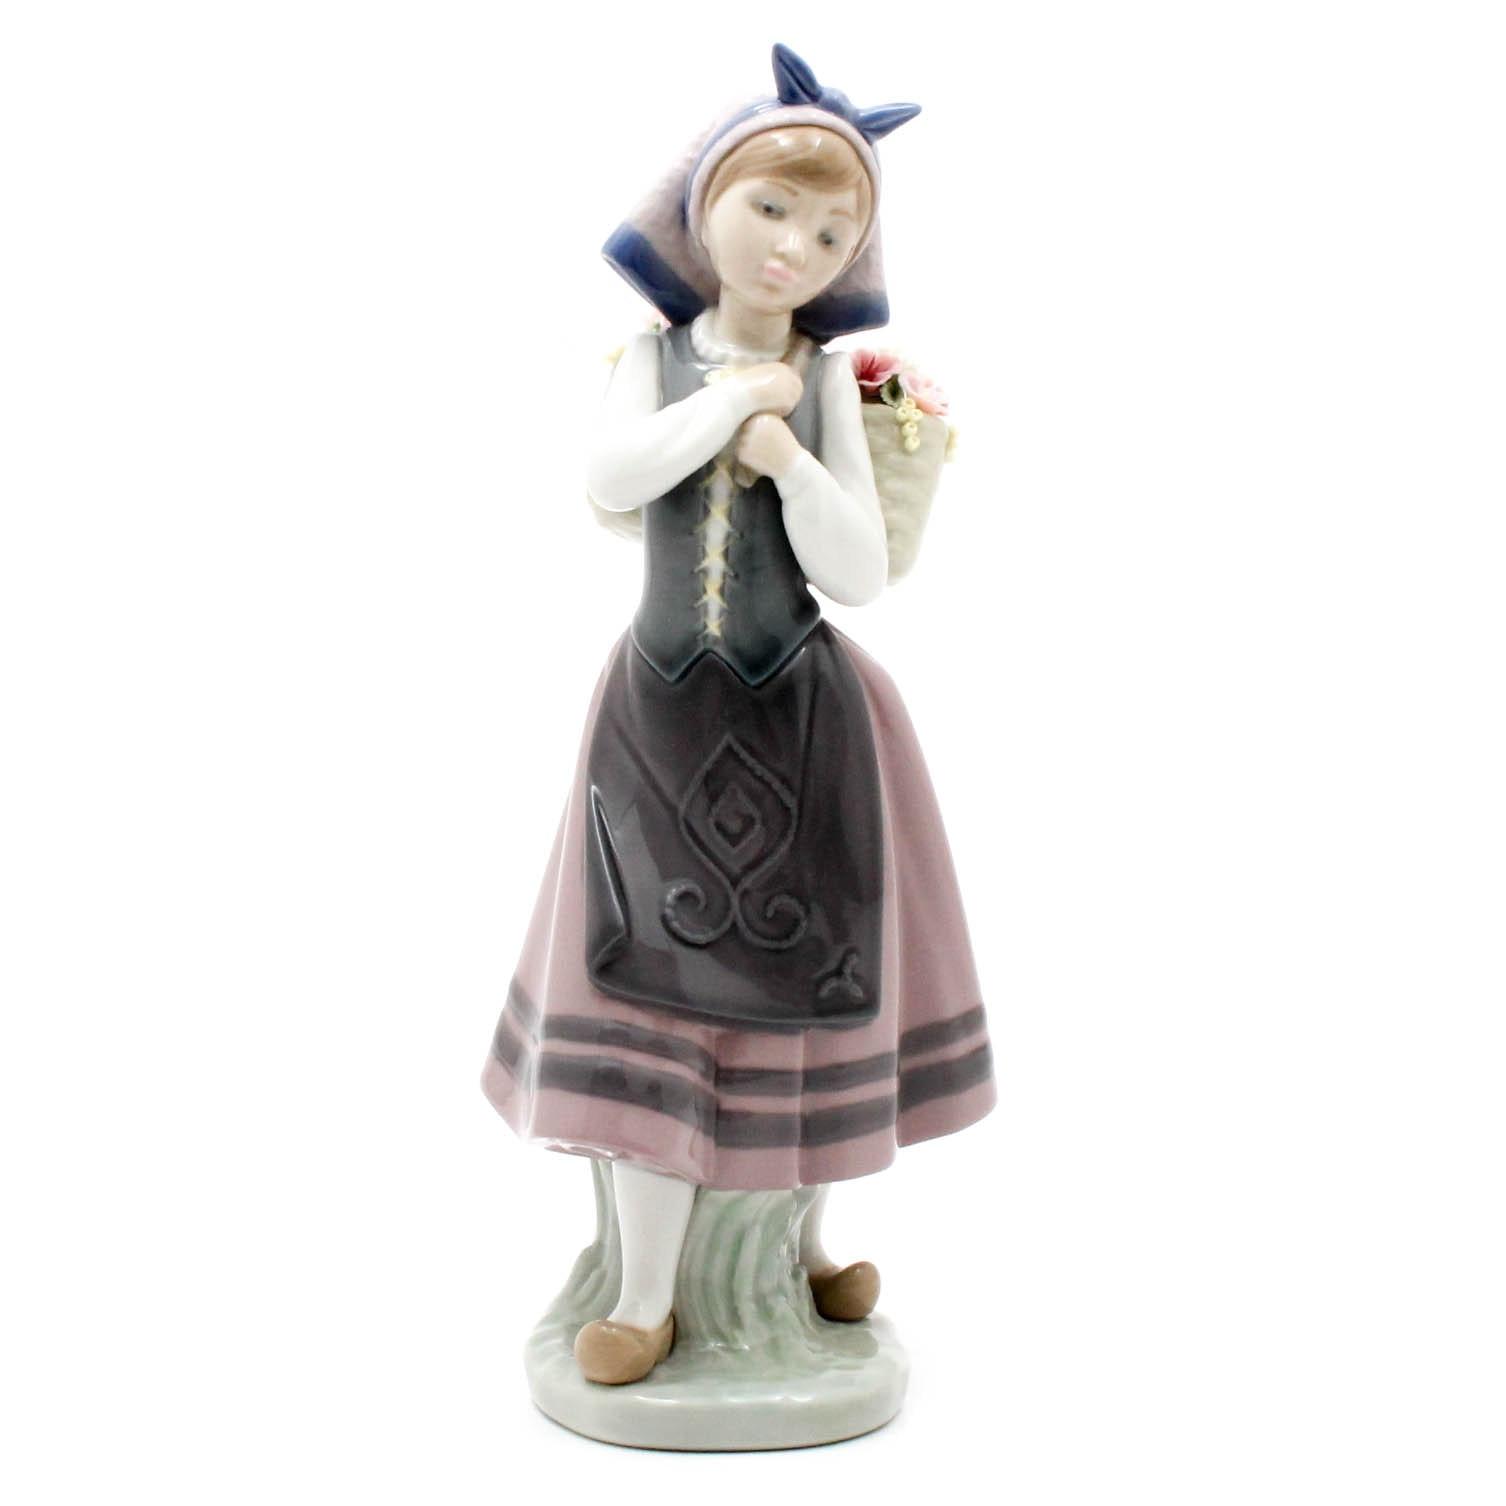 Lladró Hand-Painted Porcelain Figurine of Girl with Flower Basket